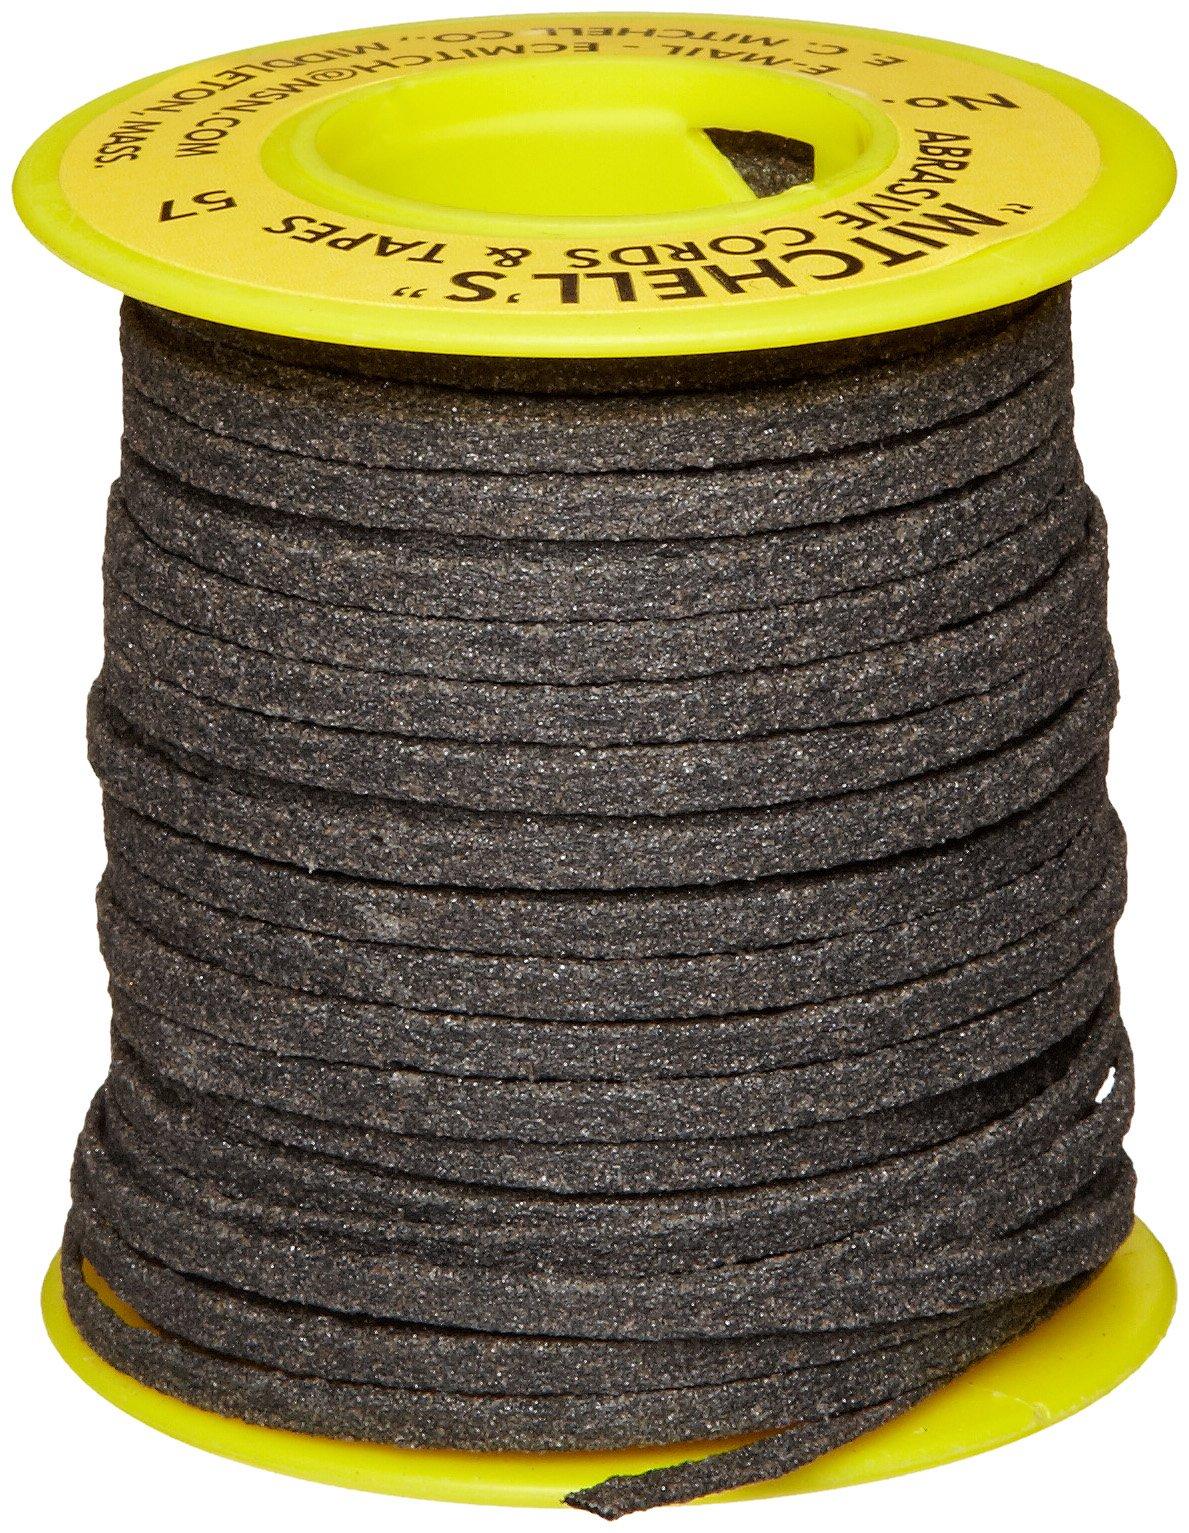 Mitchell Abrasives 57 Flat Abrasive Tape, Aluminum Oxide 150 Grit 1/8'' Wide x 50 Feet